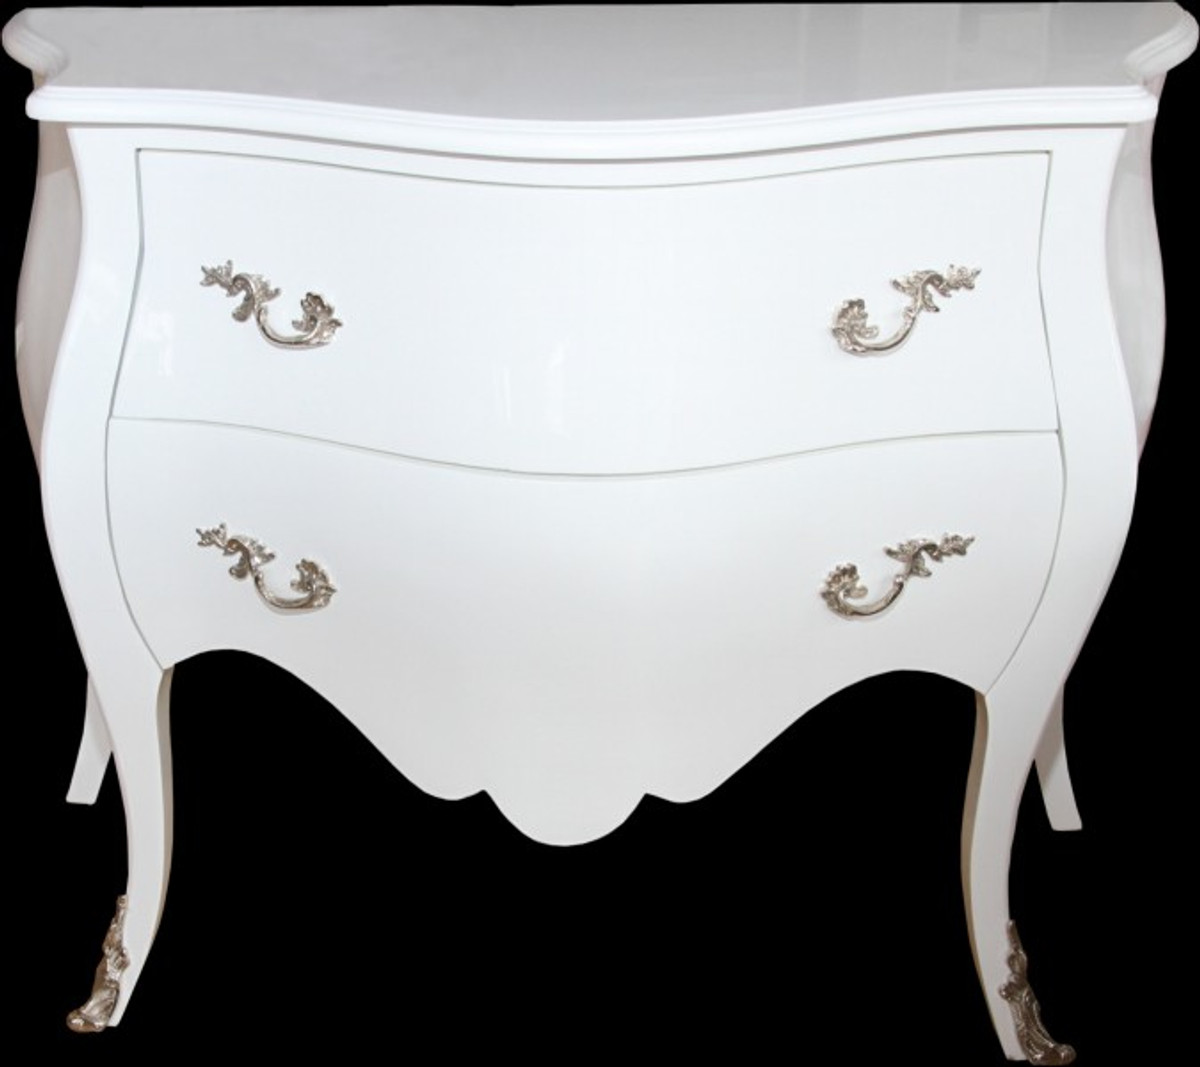 casa padrino barock kommode 100 cm wei hochglanz m bel. Black Bedroom Furniture Sets. Home Design Ideas